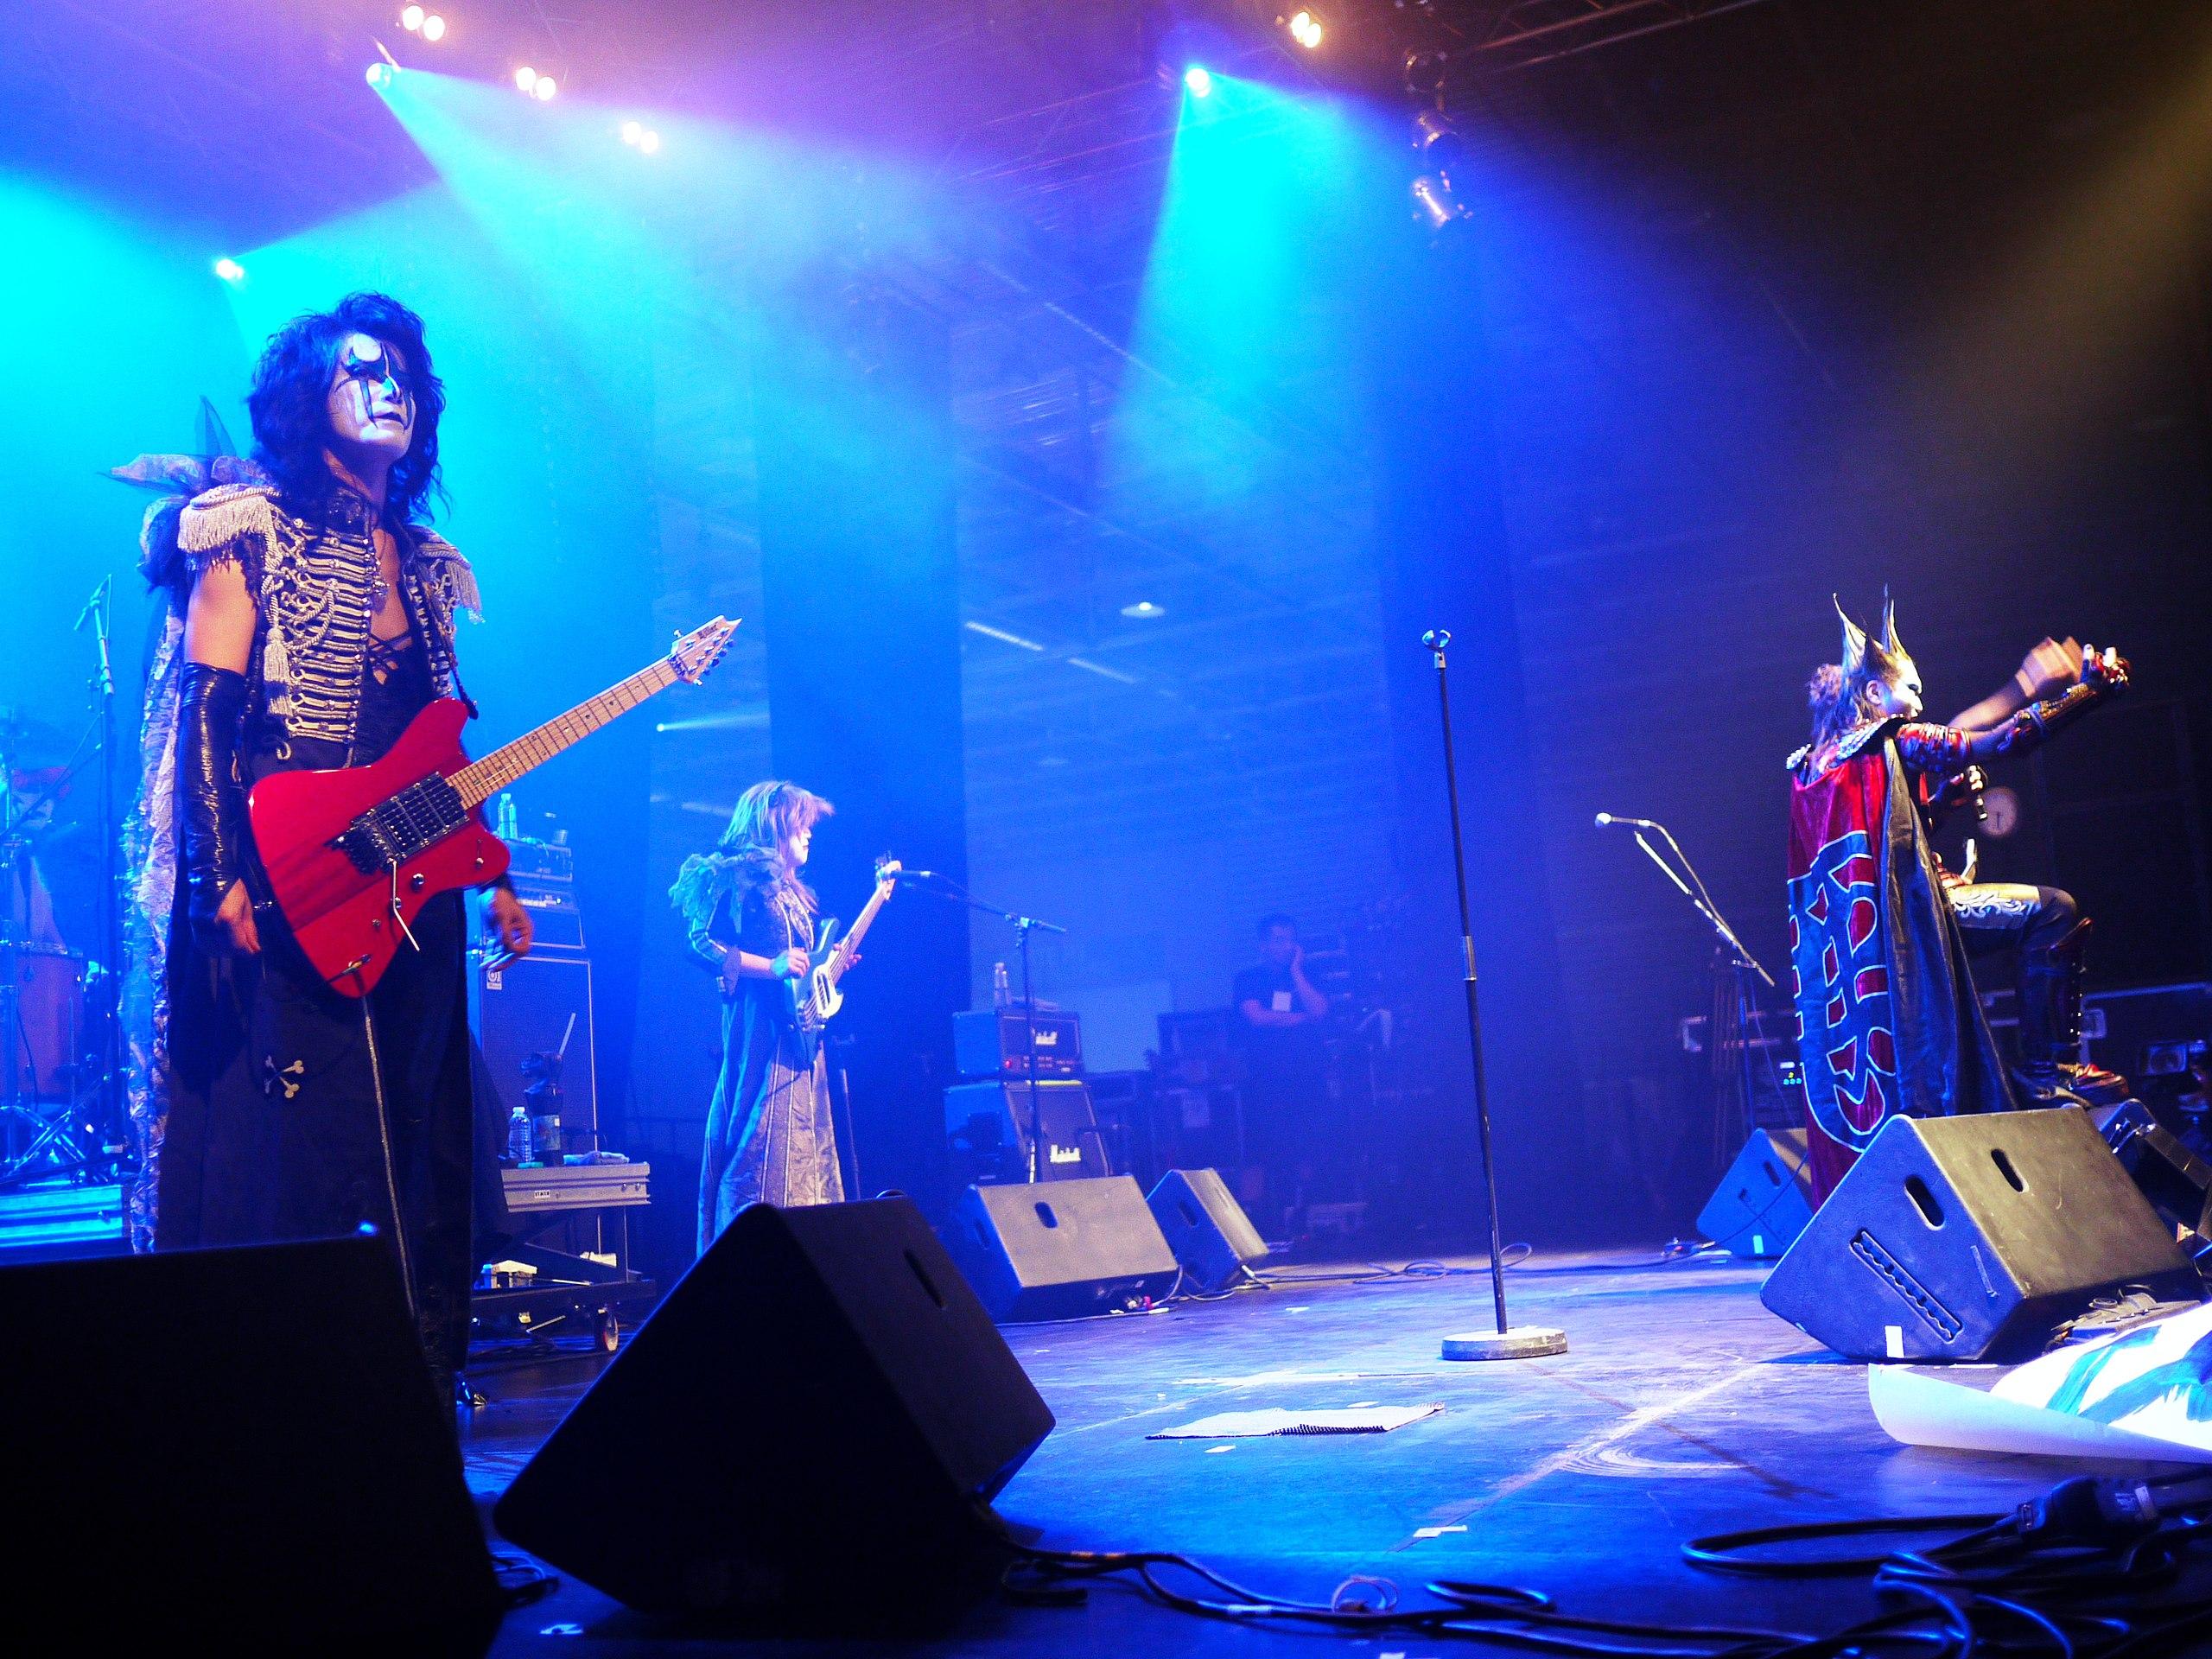 Japan Expo 2010 - Concert Seikima-II - P1470363.jpg